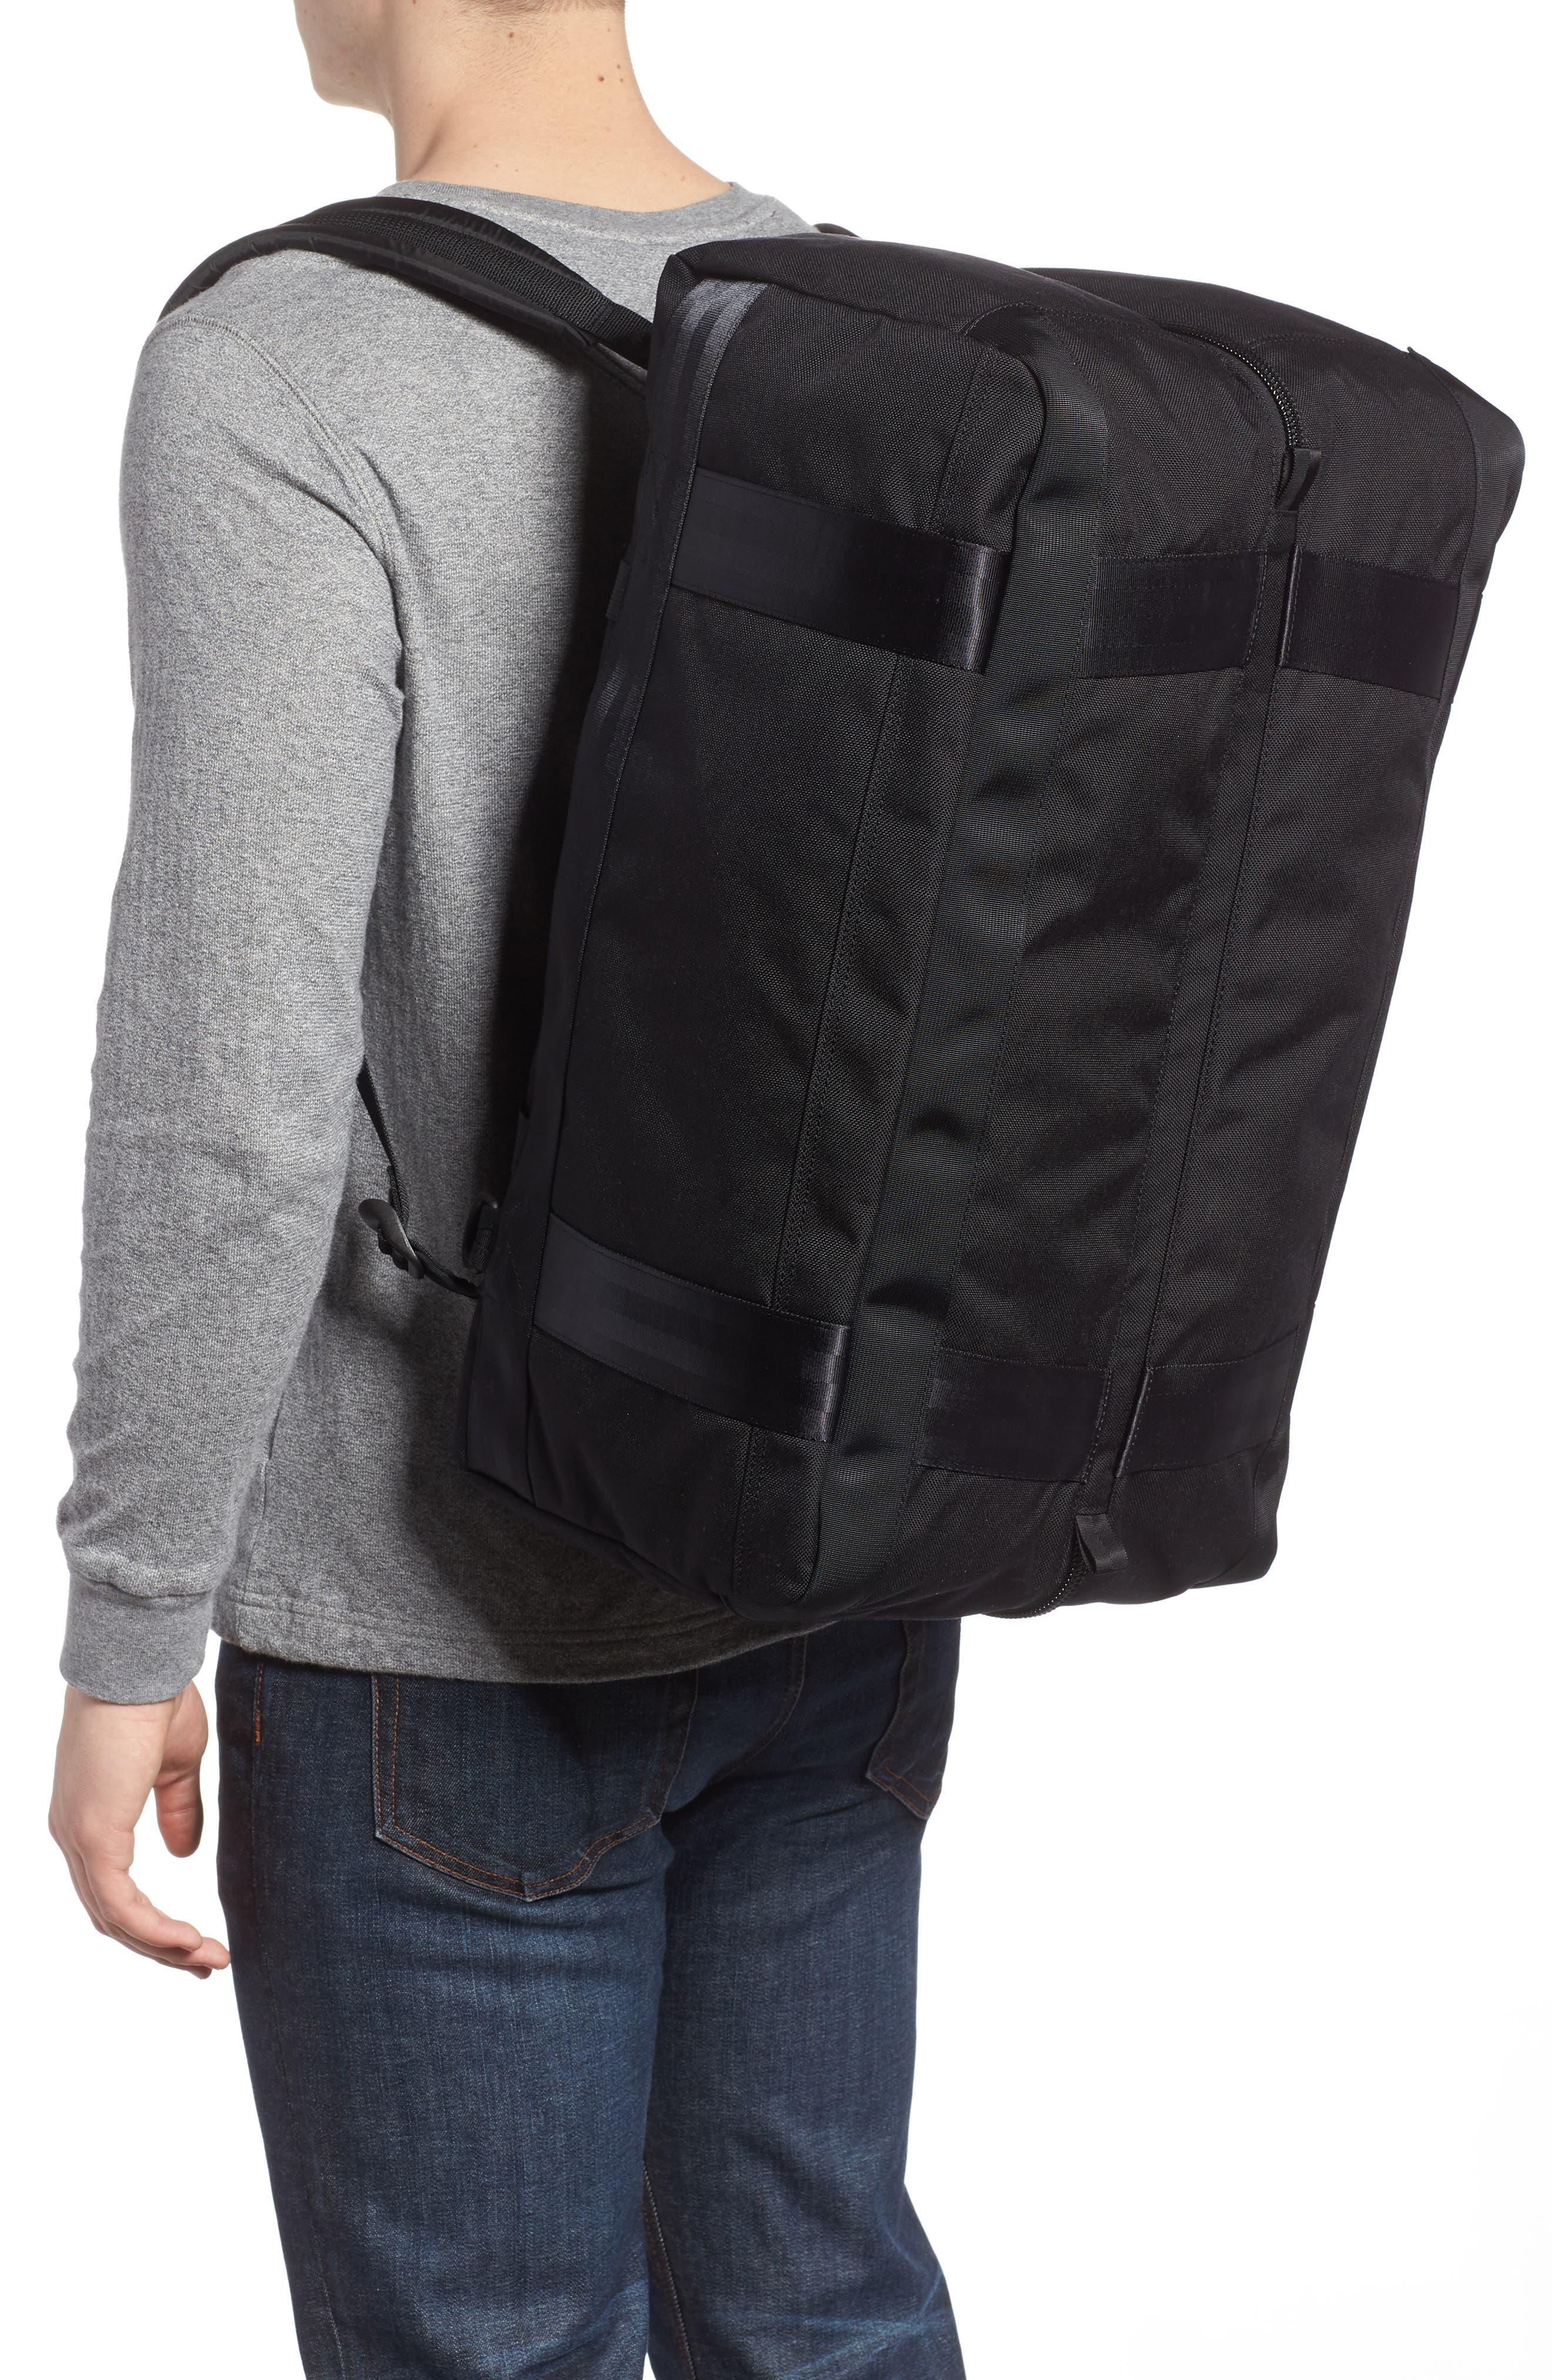 Porter-Yoshida & Co. Boothpack Convertible Duffel Bag,                             Alternate thumbnail 2, color,                             Black